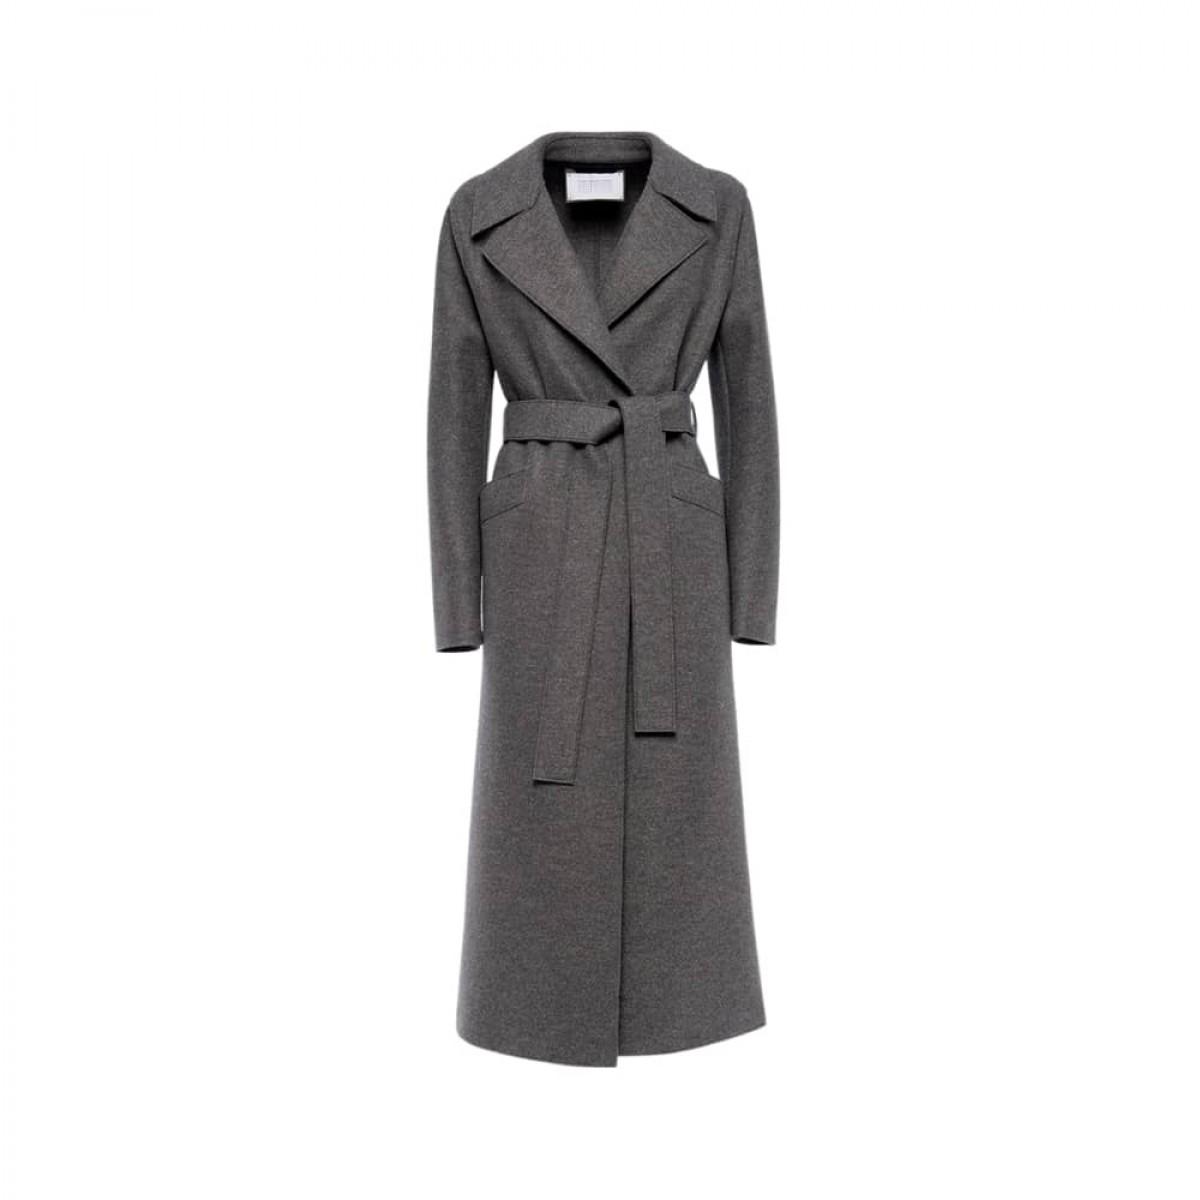 long maxi coat pressed wool - grey melange - front